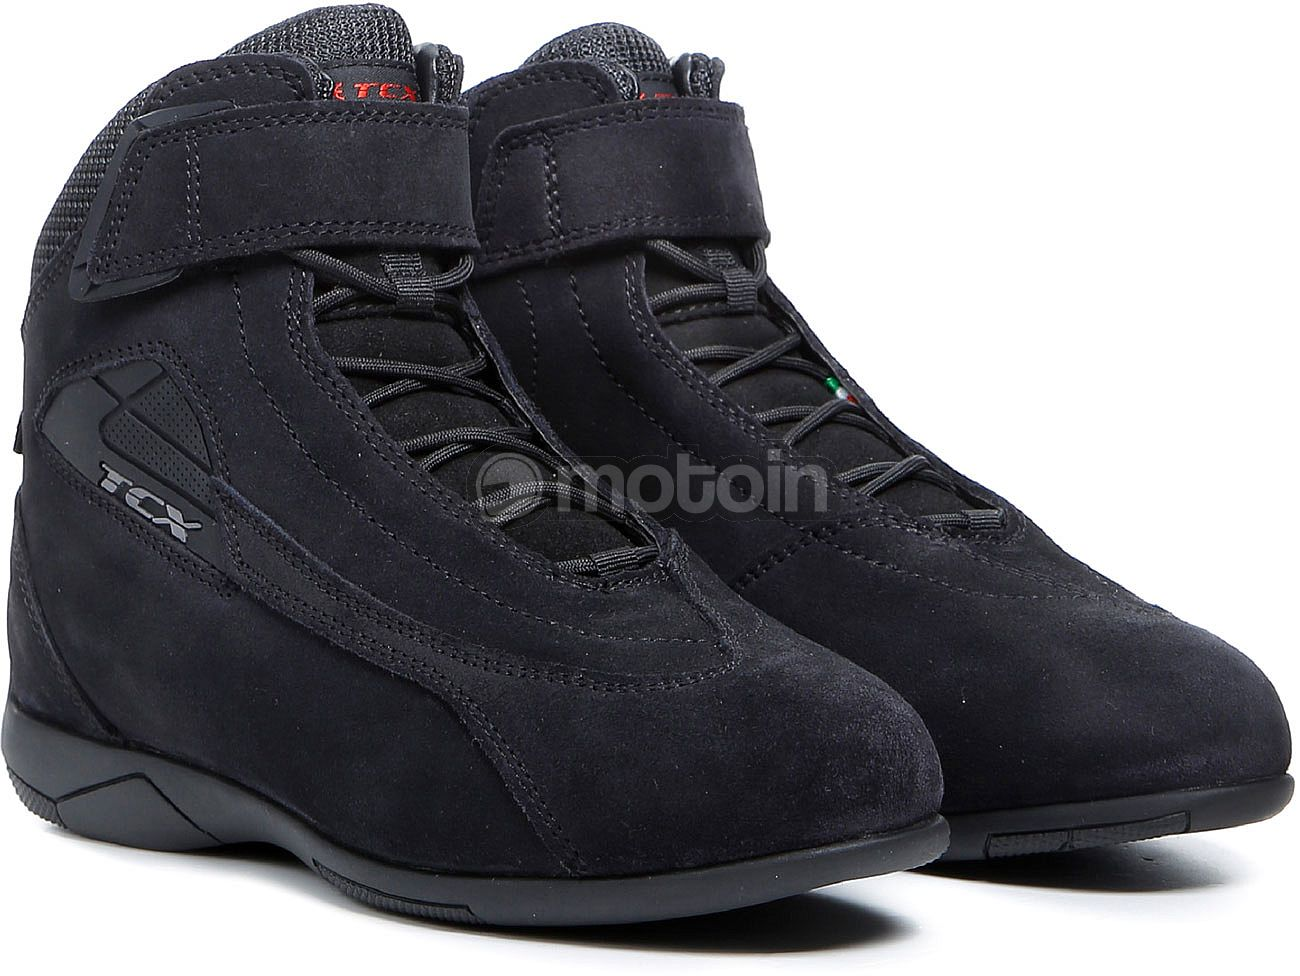 wholesale dealer b7718 124fd TCX Sport, Stiefel Damen